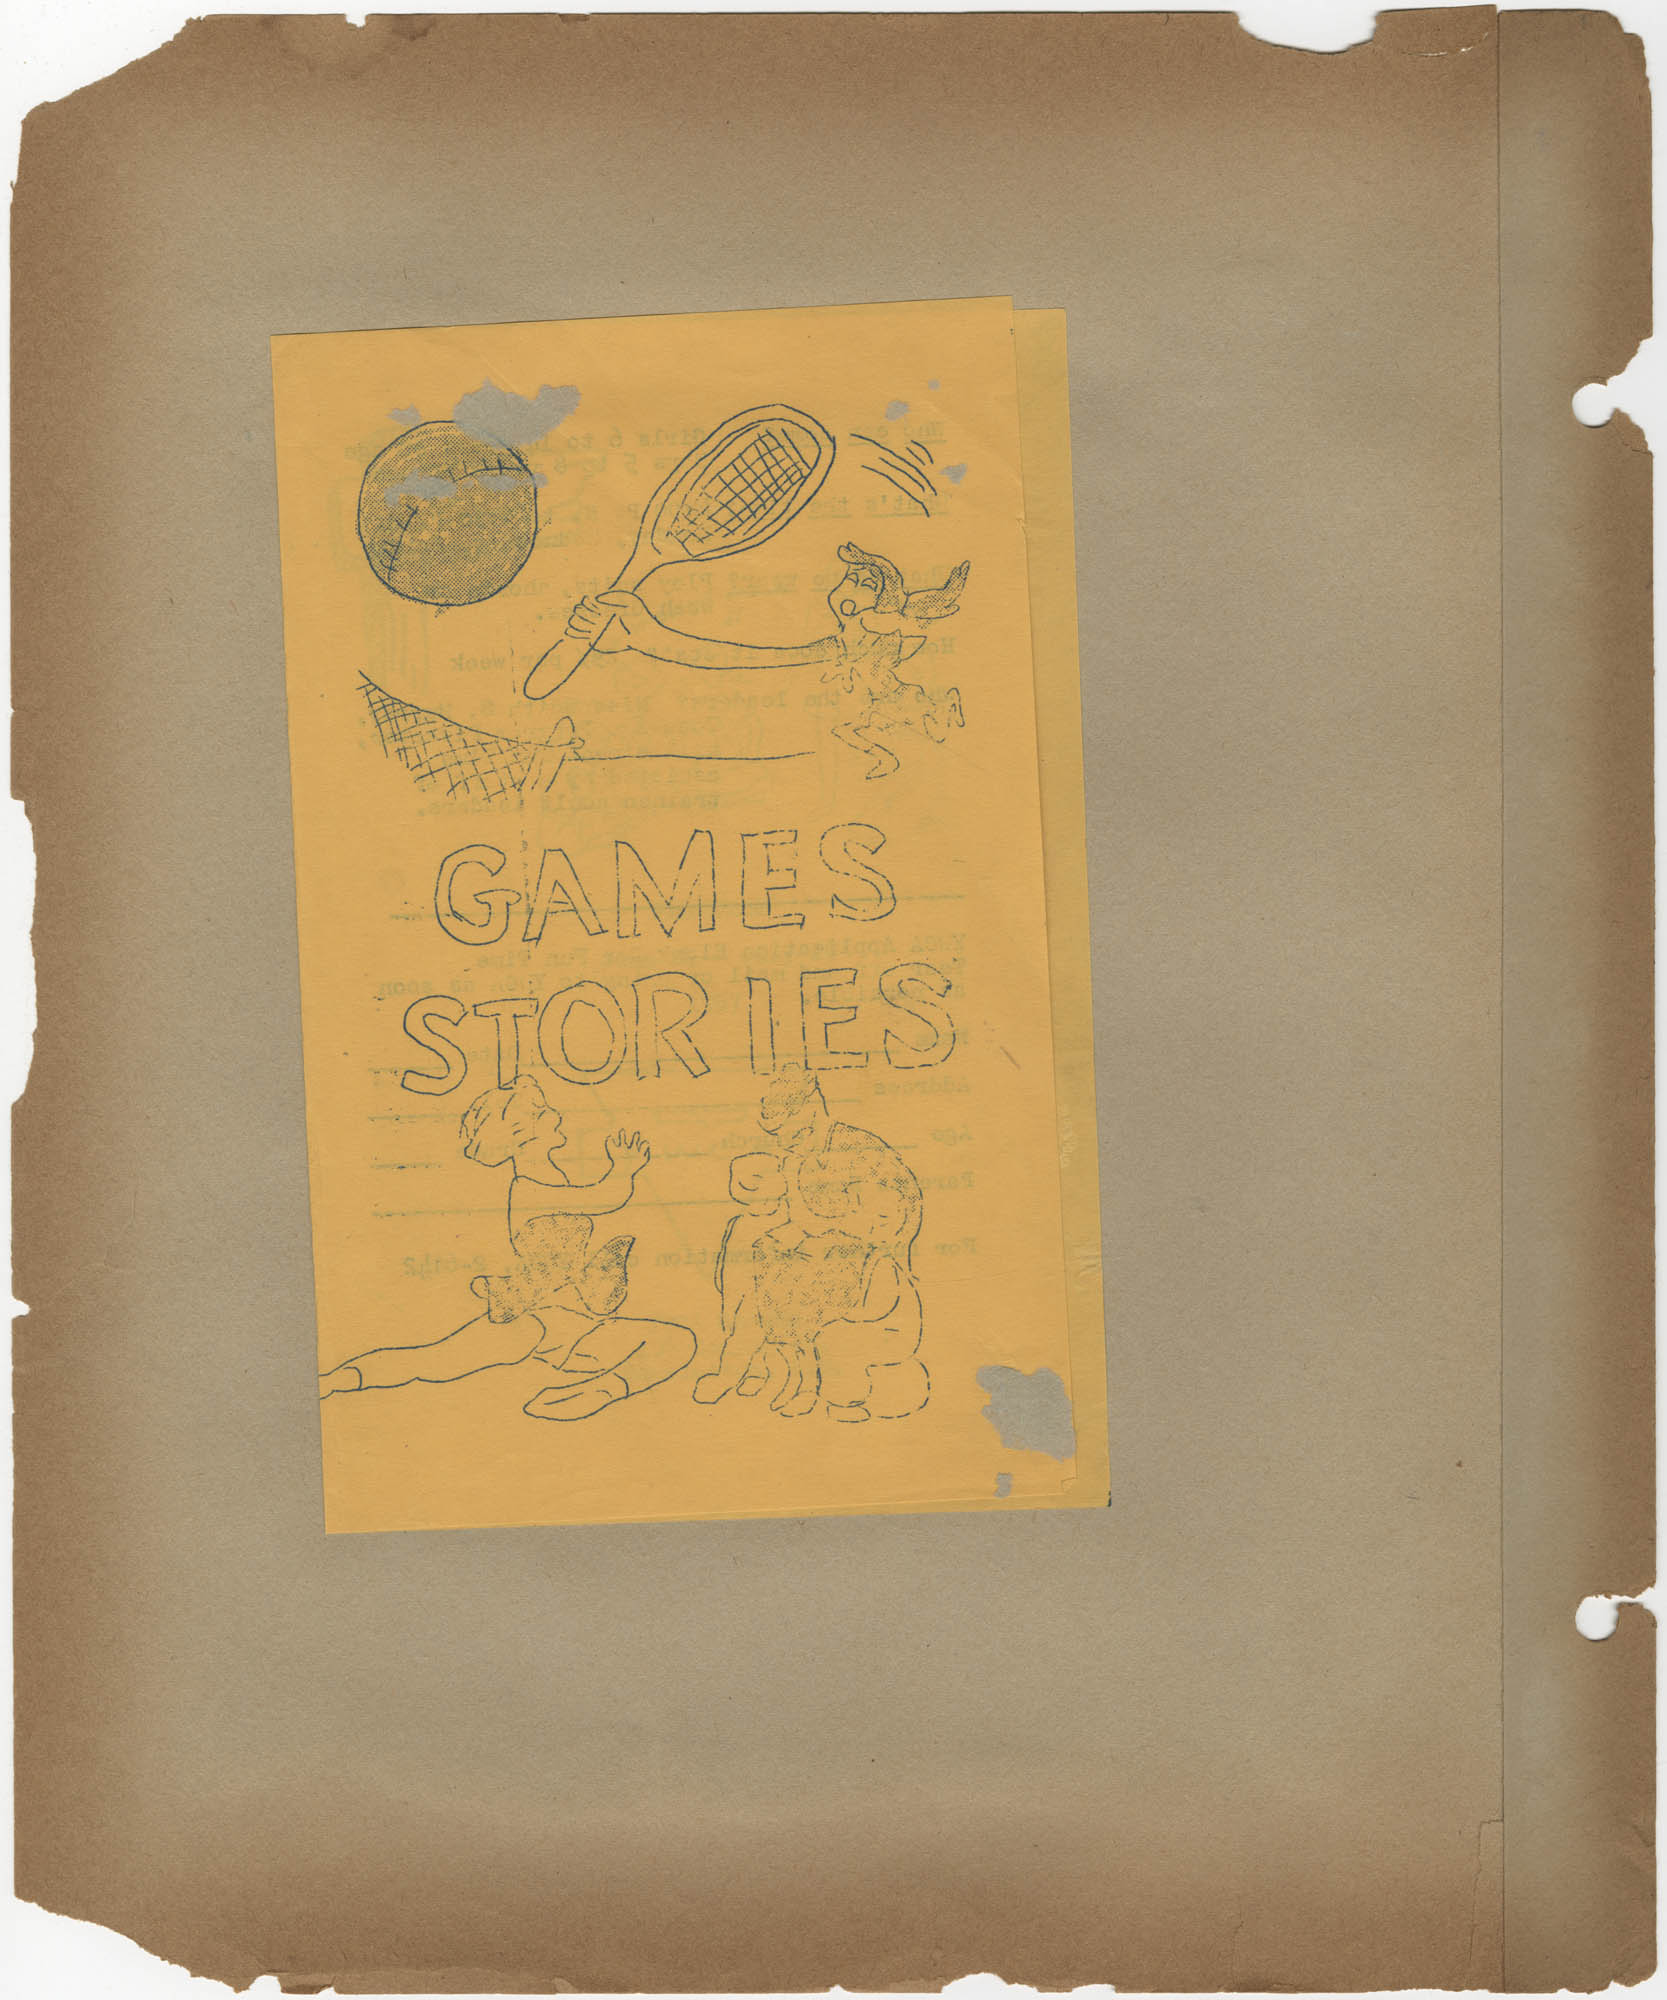 Coming Street Y.W.C.A. Scrapbook, 1953-1957, Page 107 Exterior